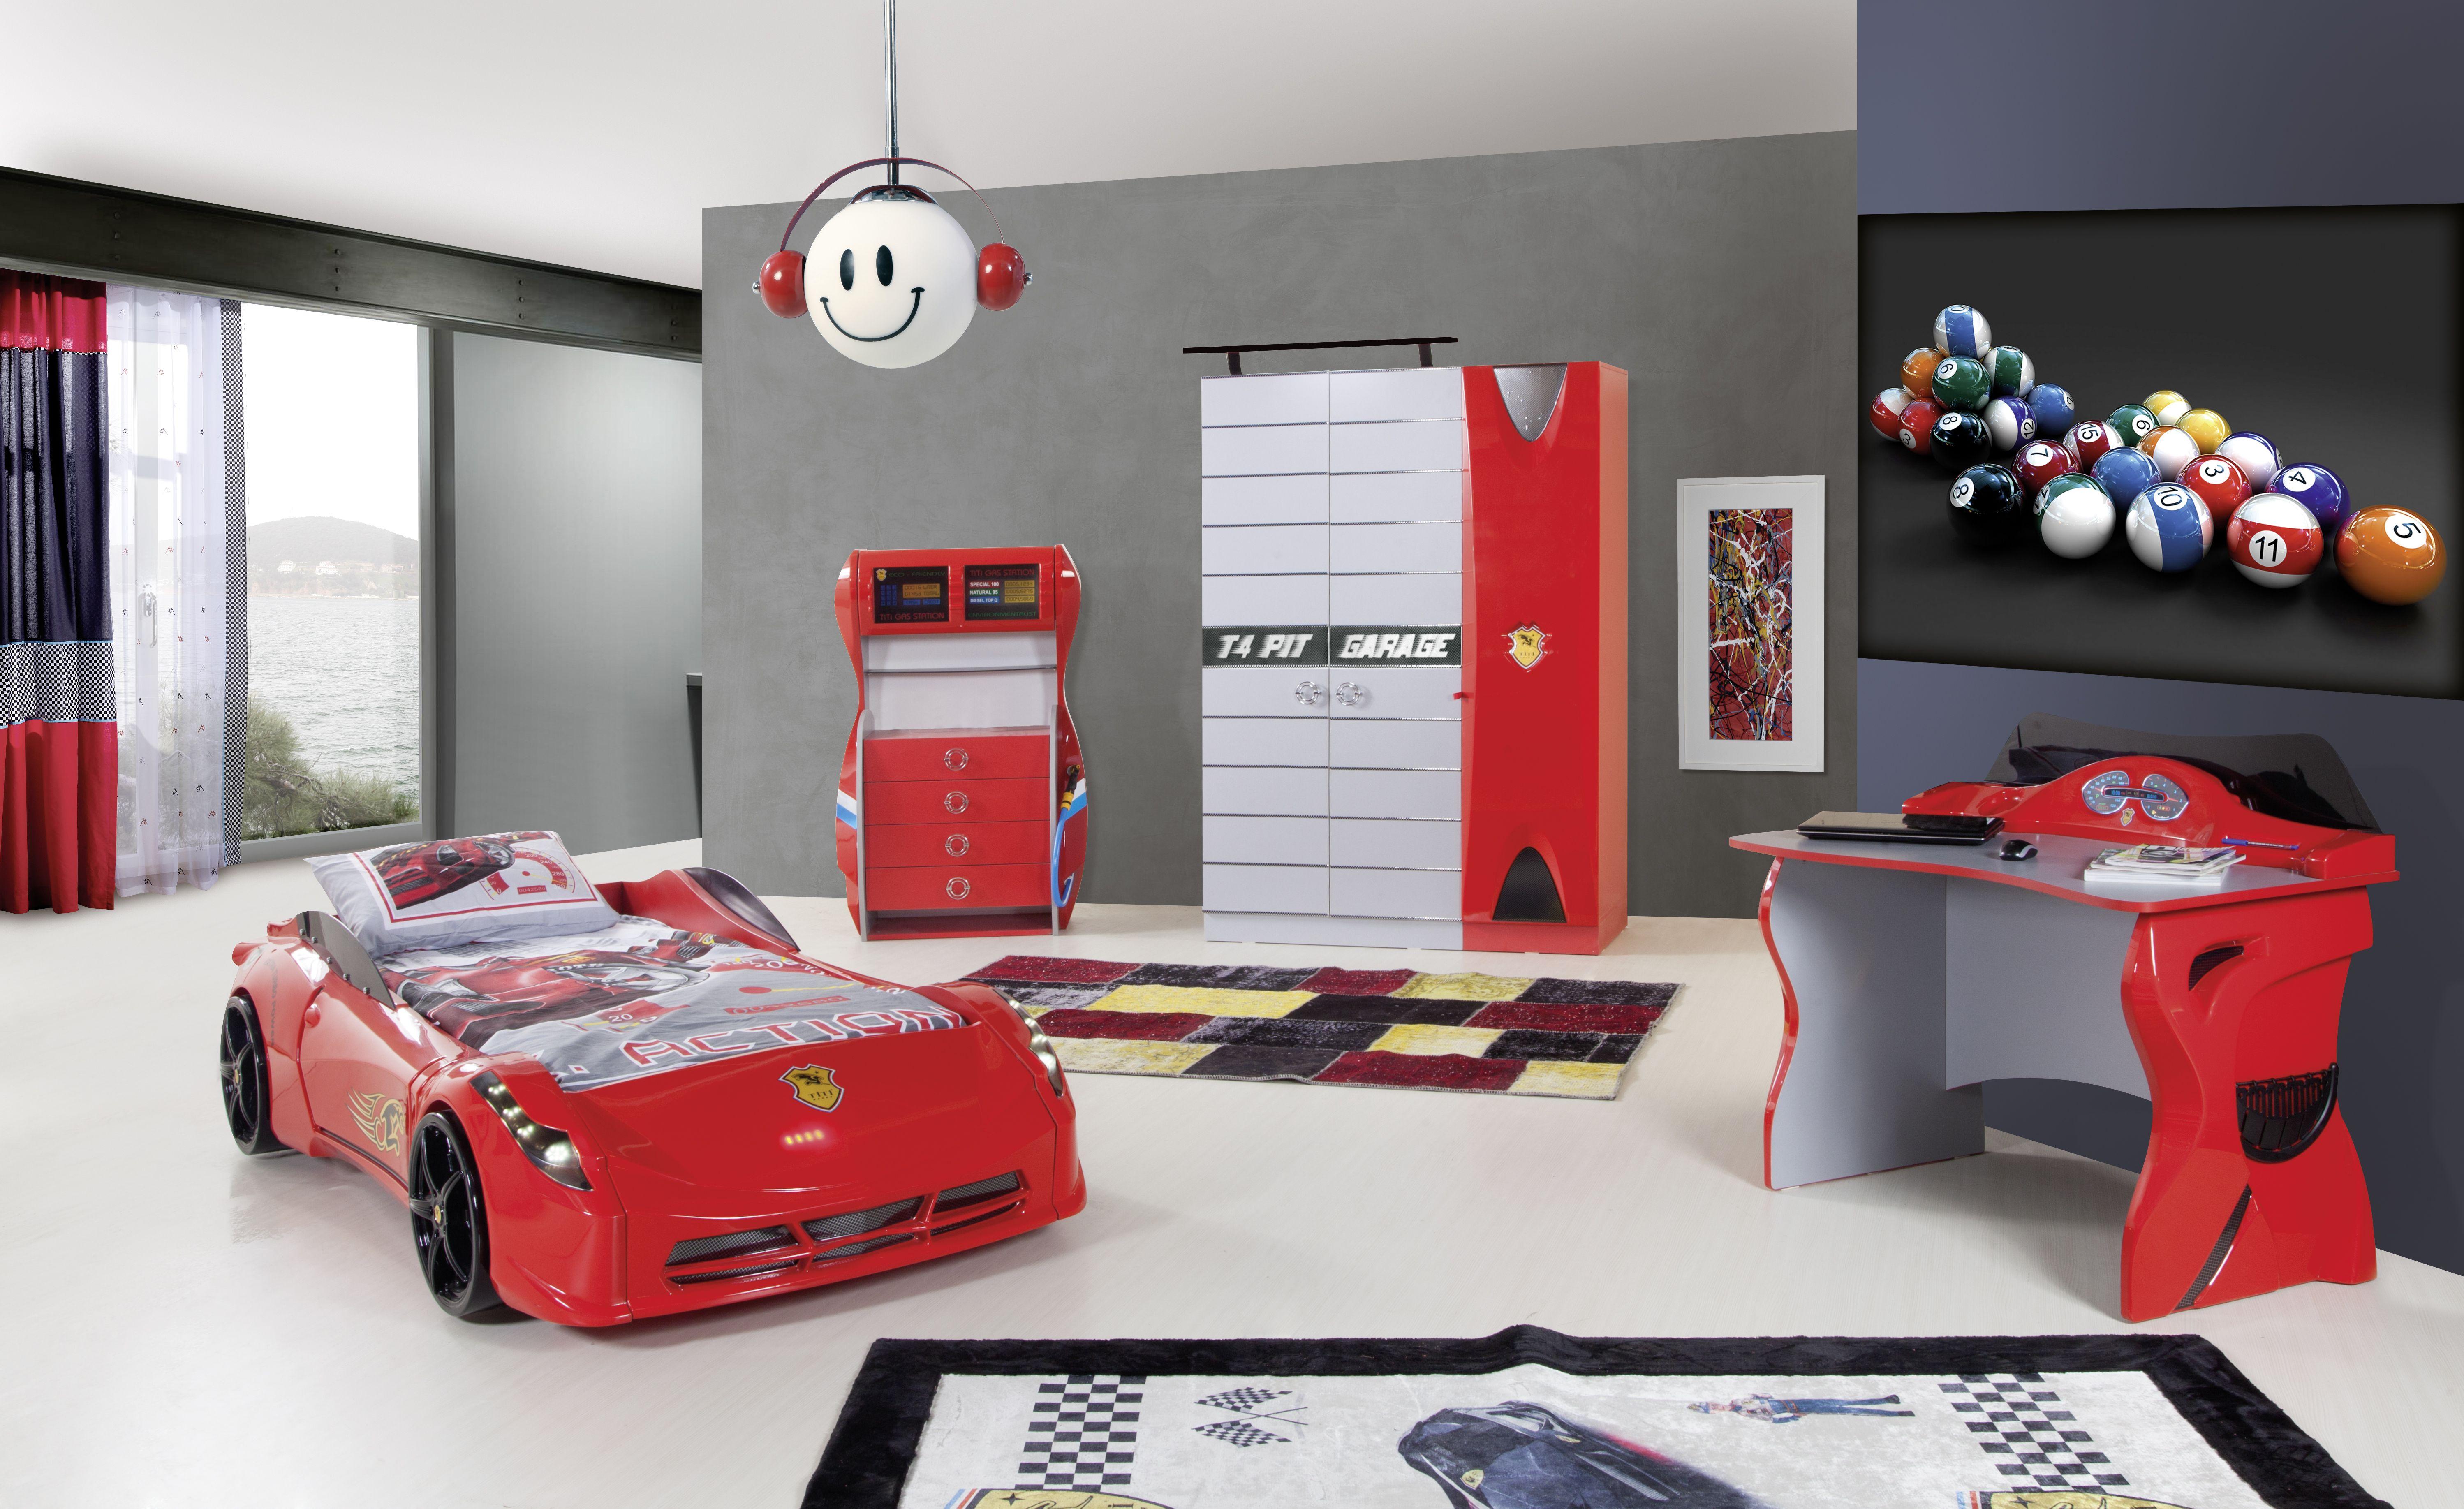 Ferrari Racer Red Bedroom Set Cars Bedroom Set Cars Bedroom Decor Cars Bed Set